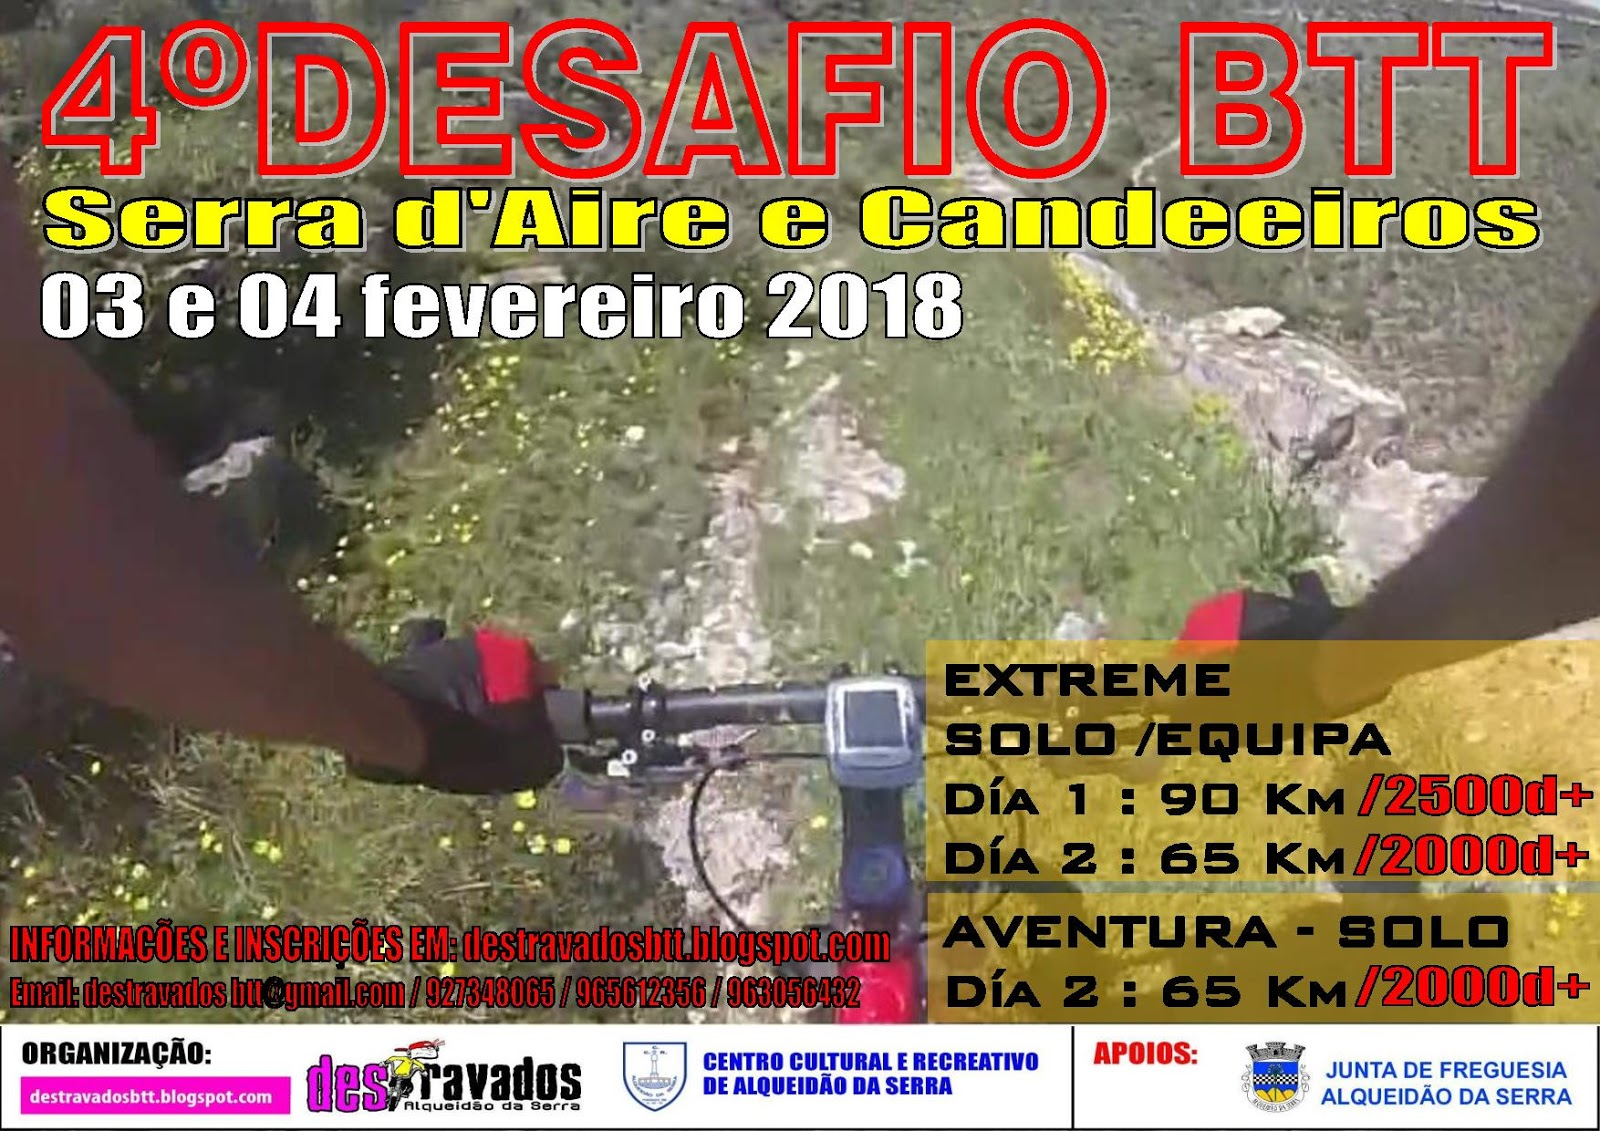 03»04FEV * SERRA D'AIRE – CANDEEIROS